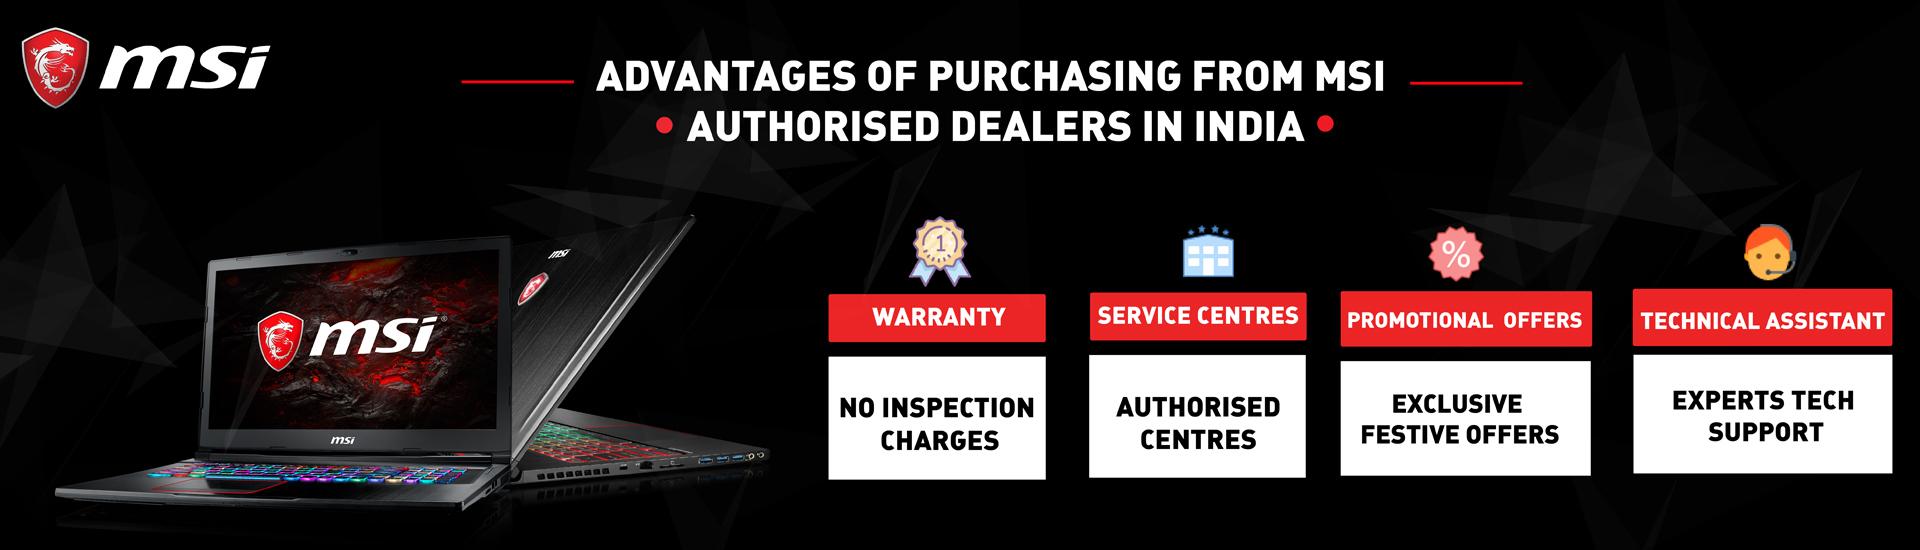 MSI India Announcement-Warranty